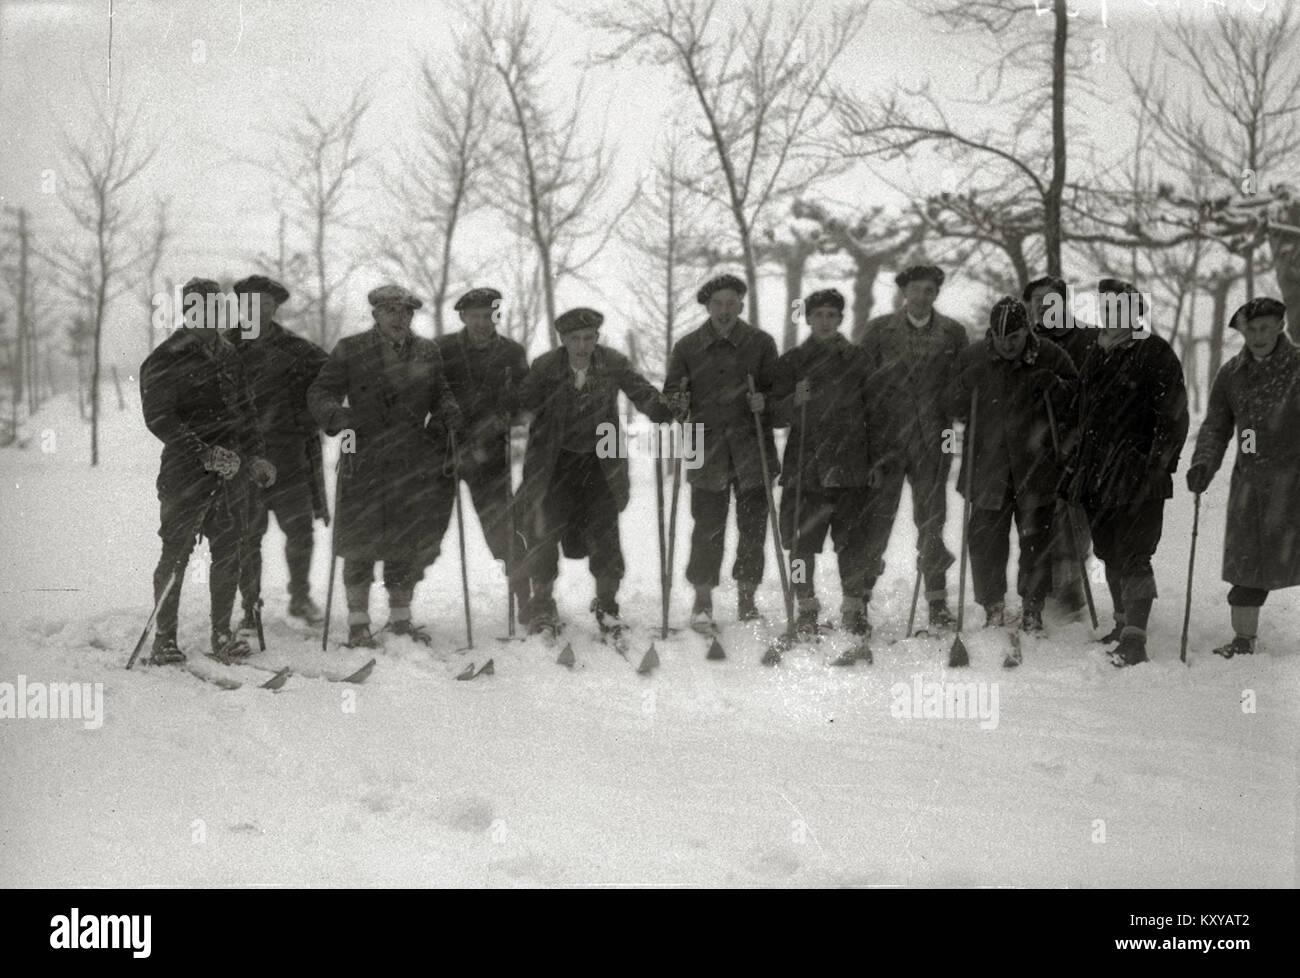 Grupo de hombres con esquís hacia el santuario de Arantzazu (2 de 4) - Fondo Car-Kutxa Fototeka - Stock Image